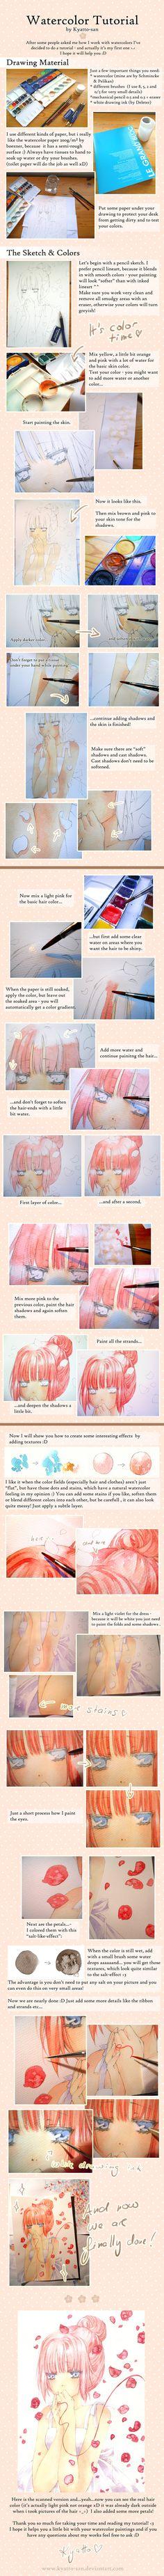 Just Be Friends - Watercolor Tutorial by Kyatto-san.deviantart.com on @deviantART